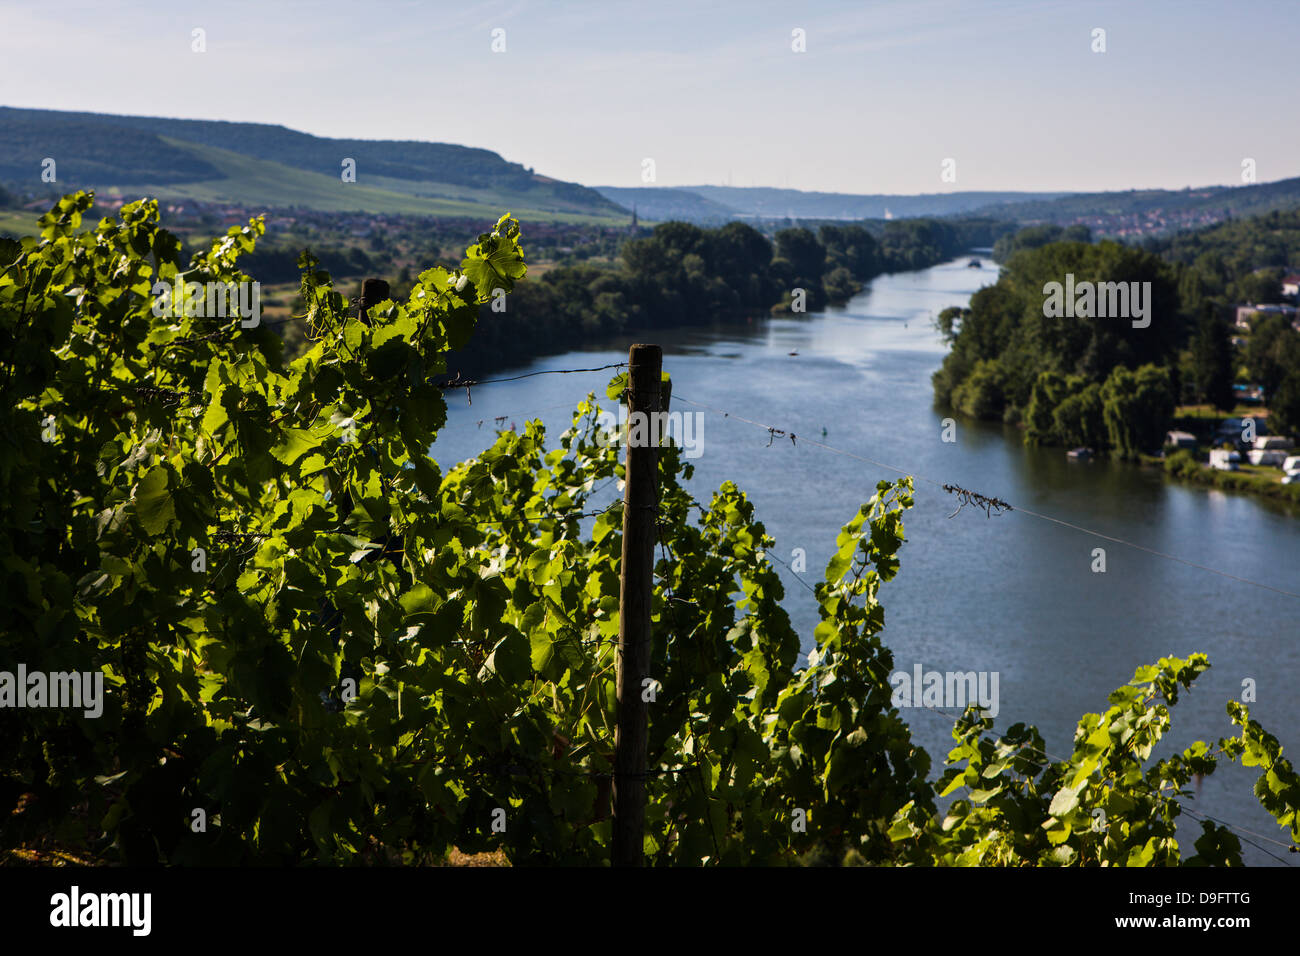 La vigne au-dessus de la vallée principale, Franconia, Bavaria, Germany Photo Stock